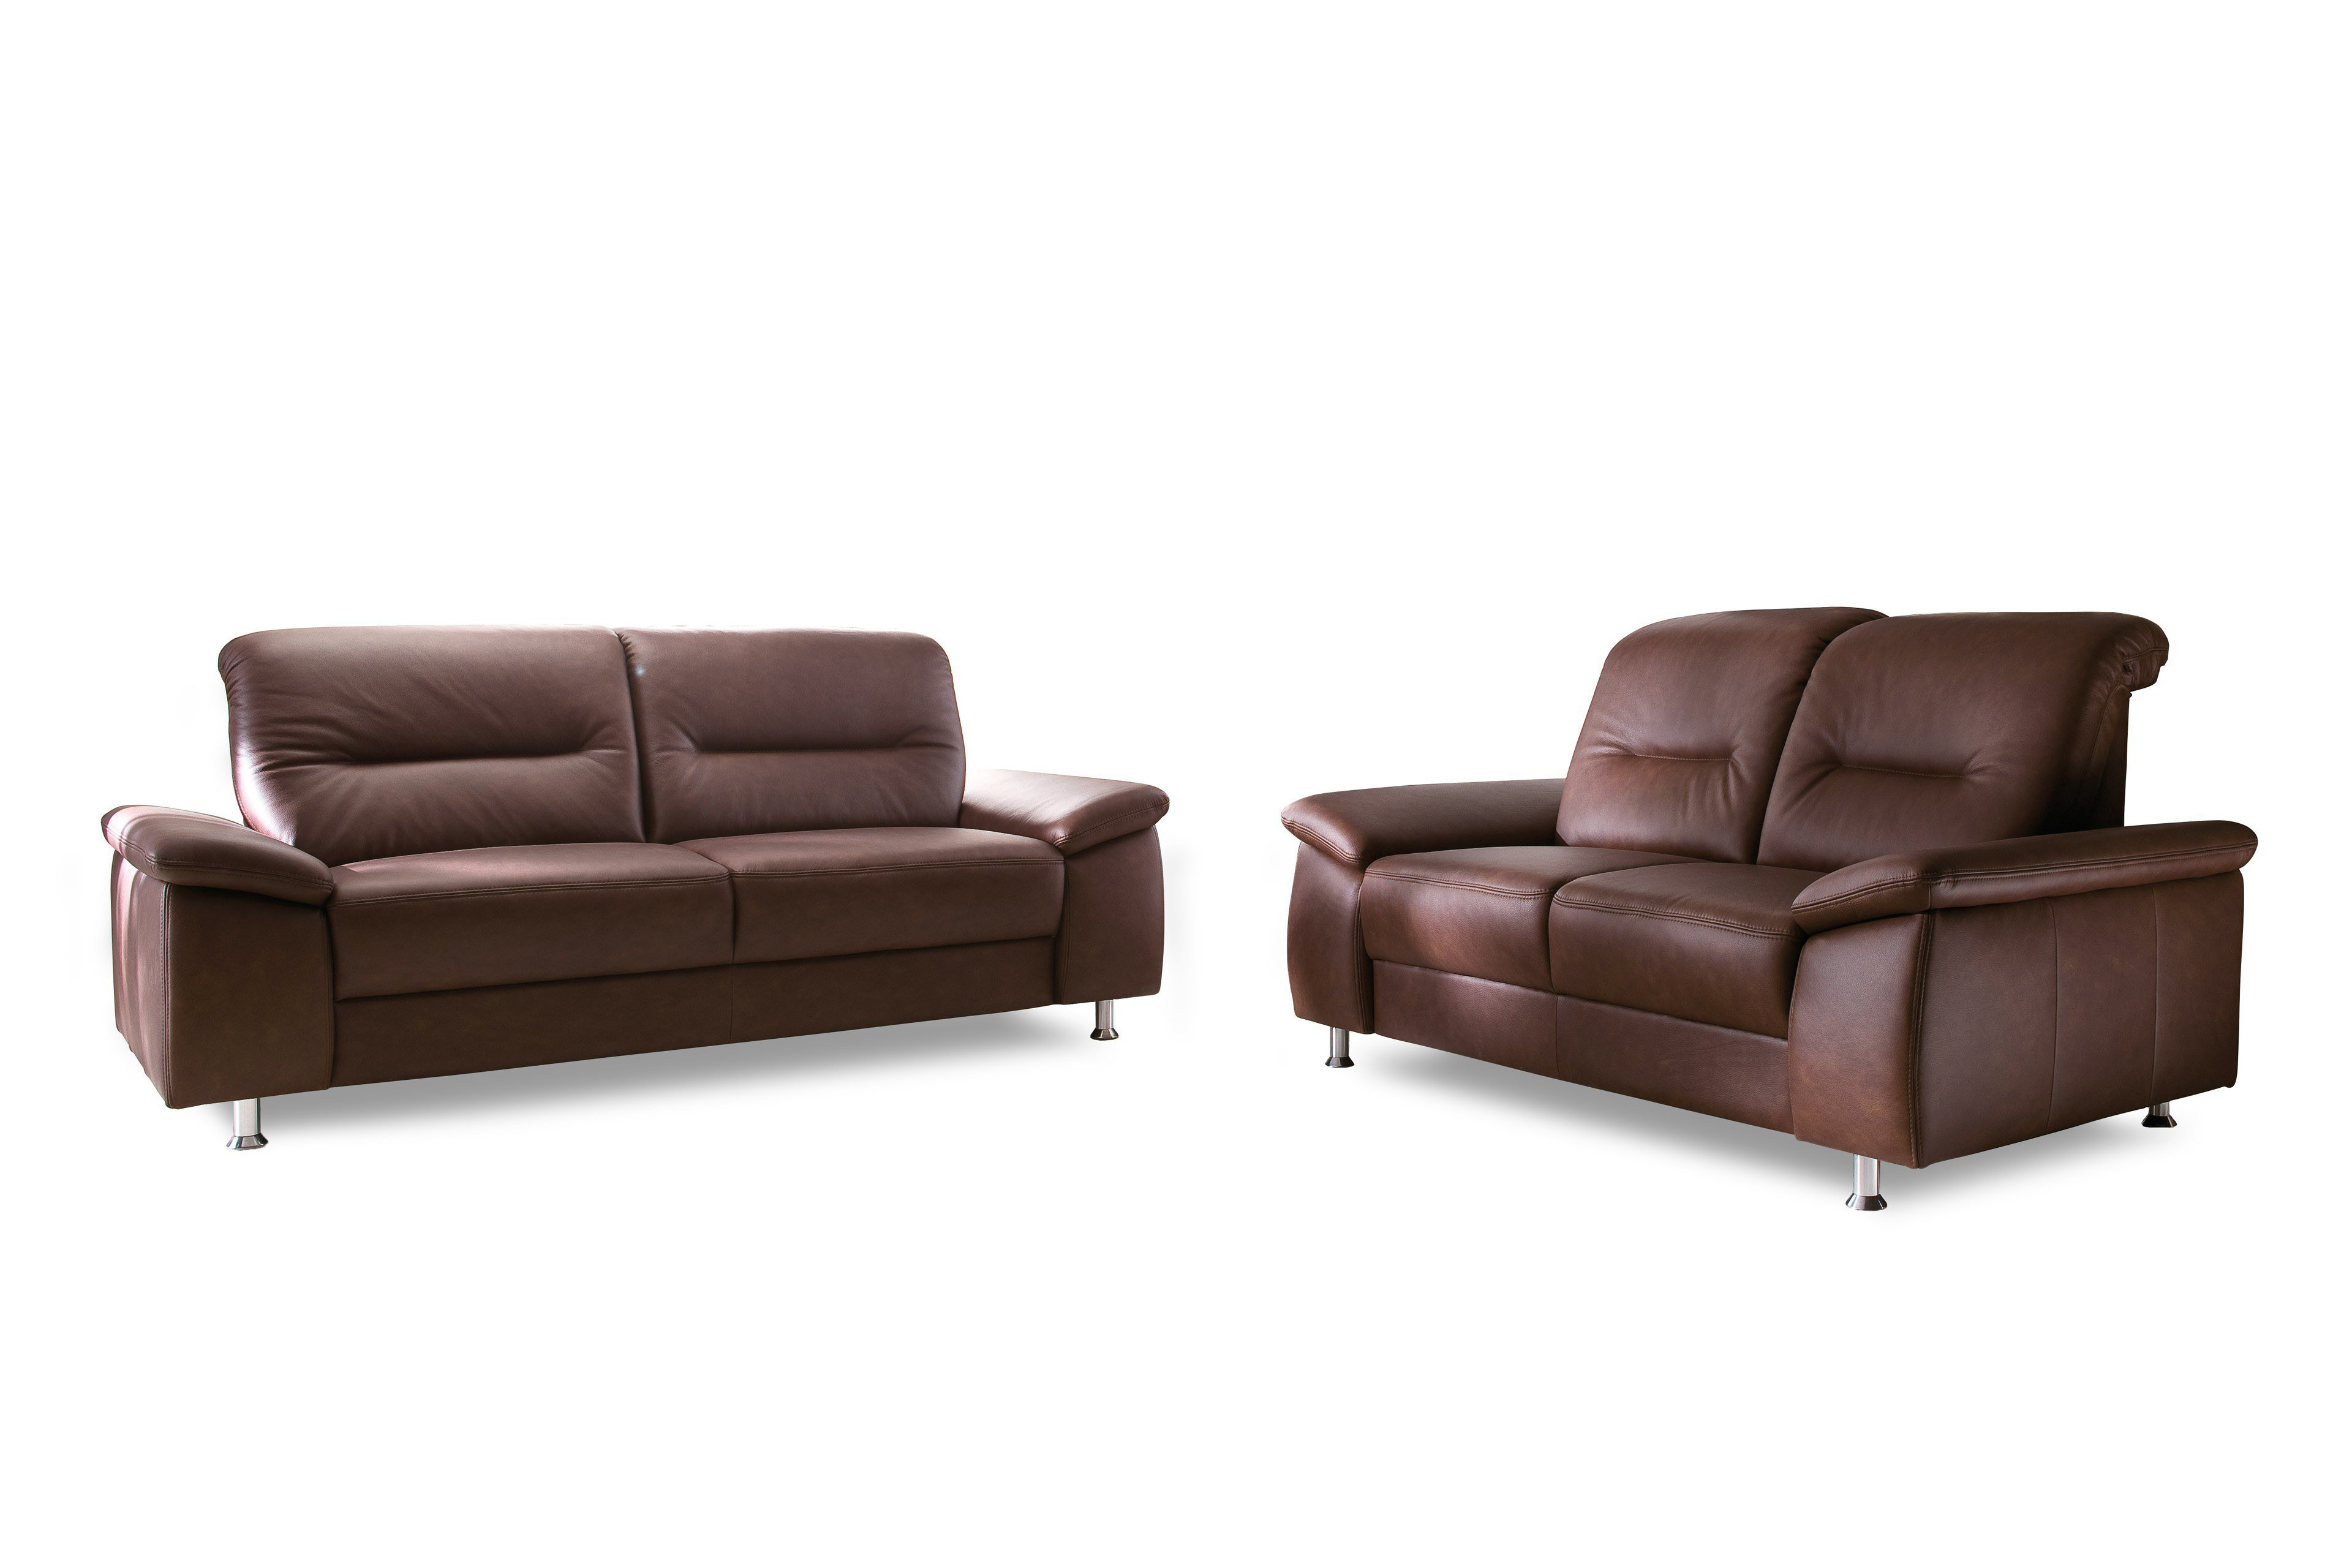 gruber polsterm bel colette sofa duo dunkelbraun m bel letz ihr online shop. Black Bedroom Furniture Sets. Home Design Ideas